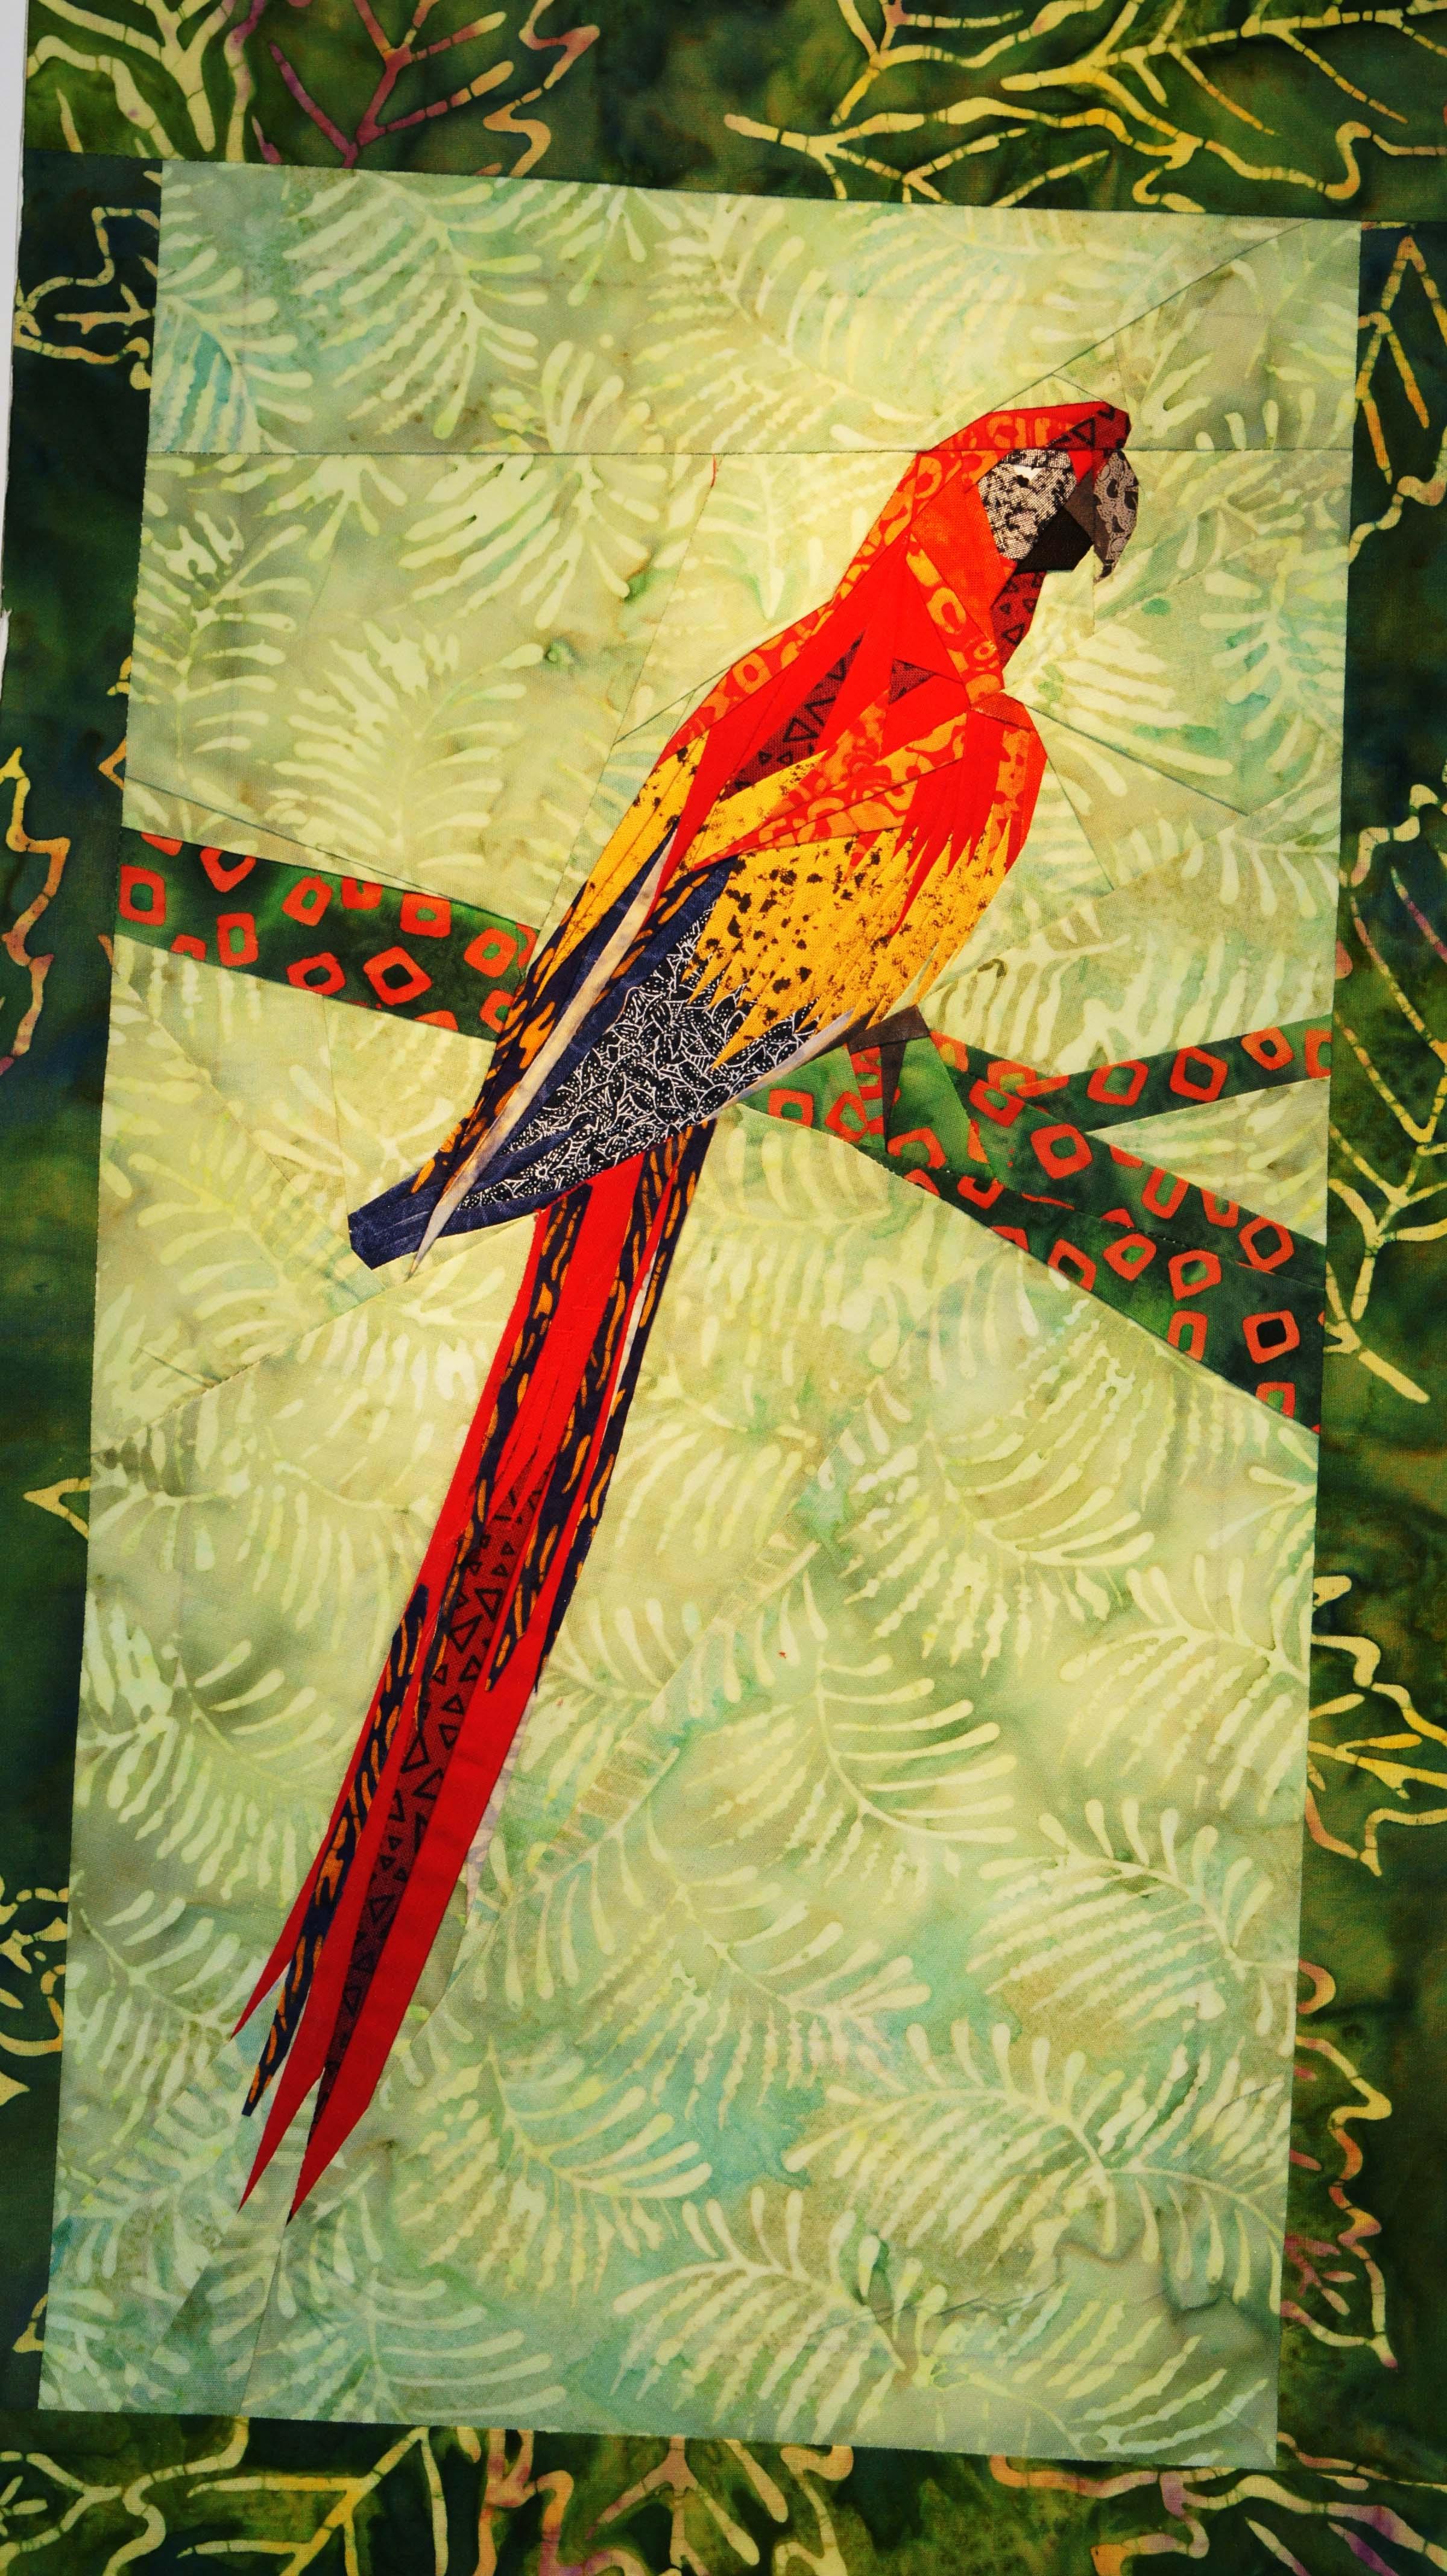 dsc01616-red-macaw.jpg